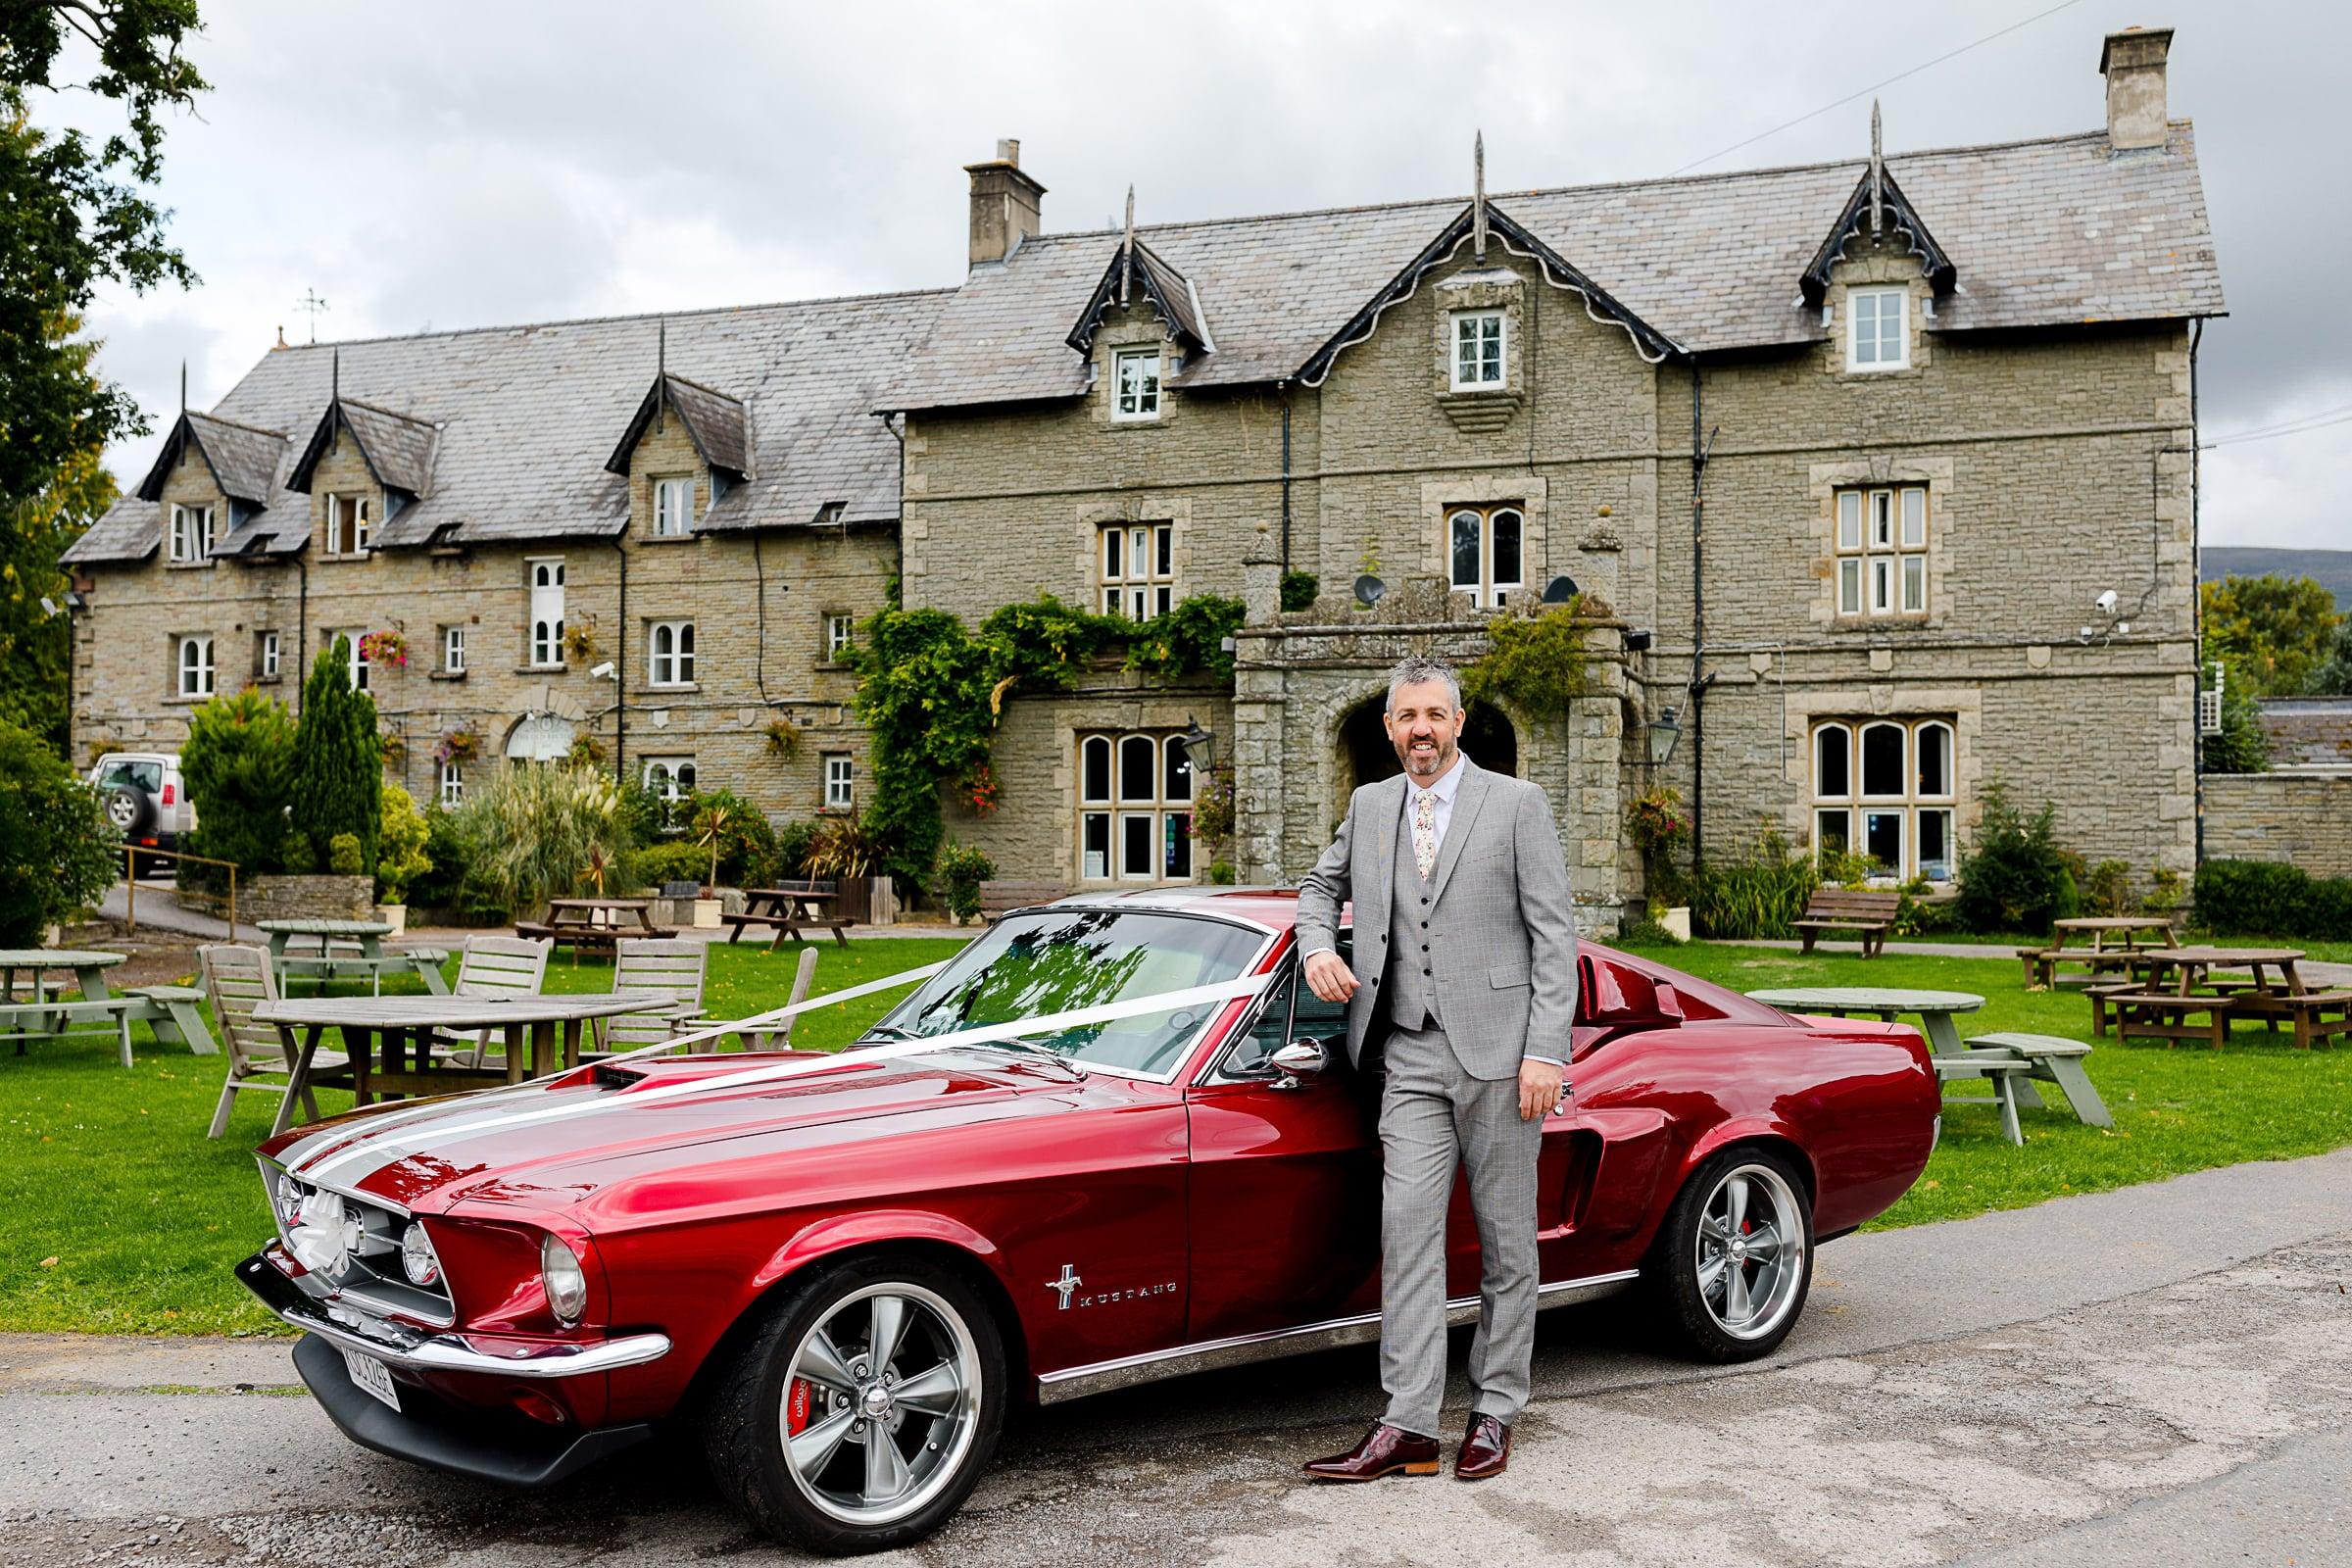 Mustang Wedding Car Wales